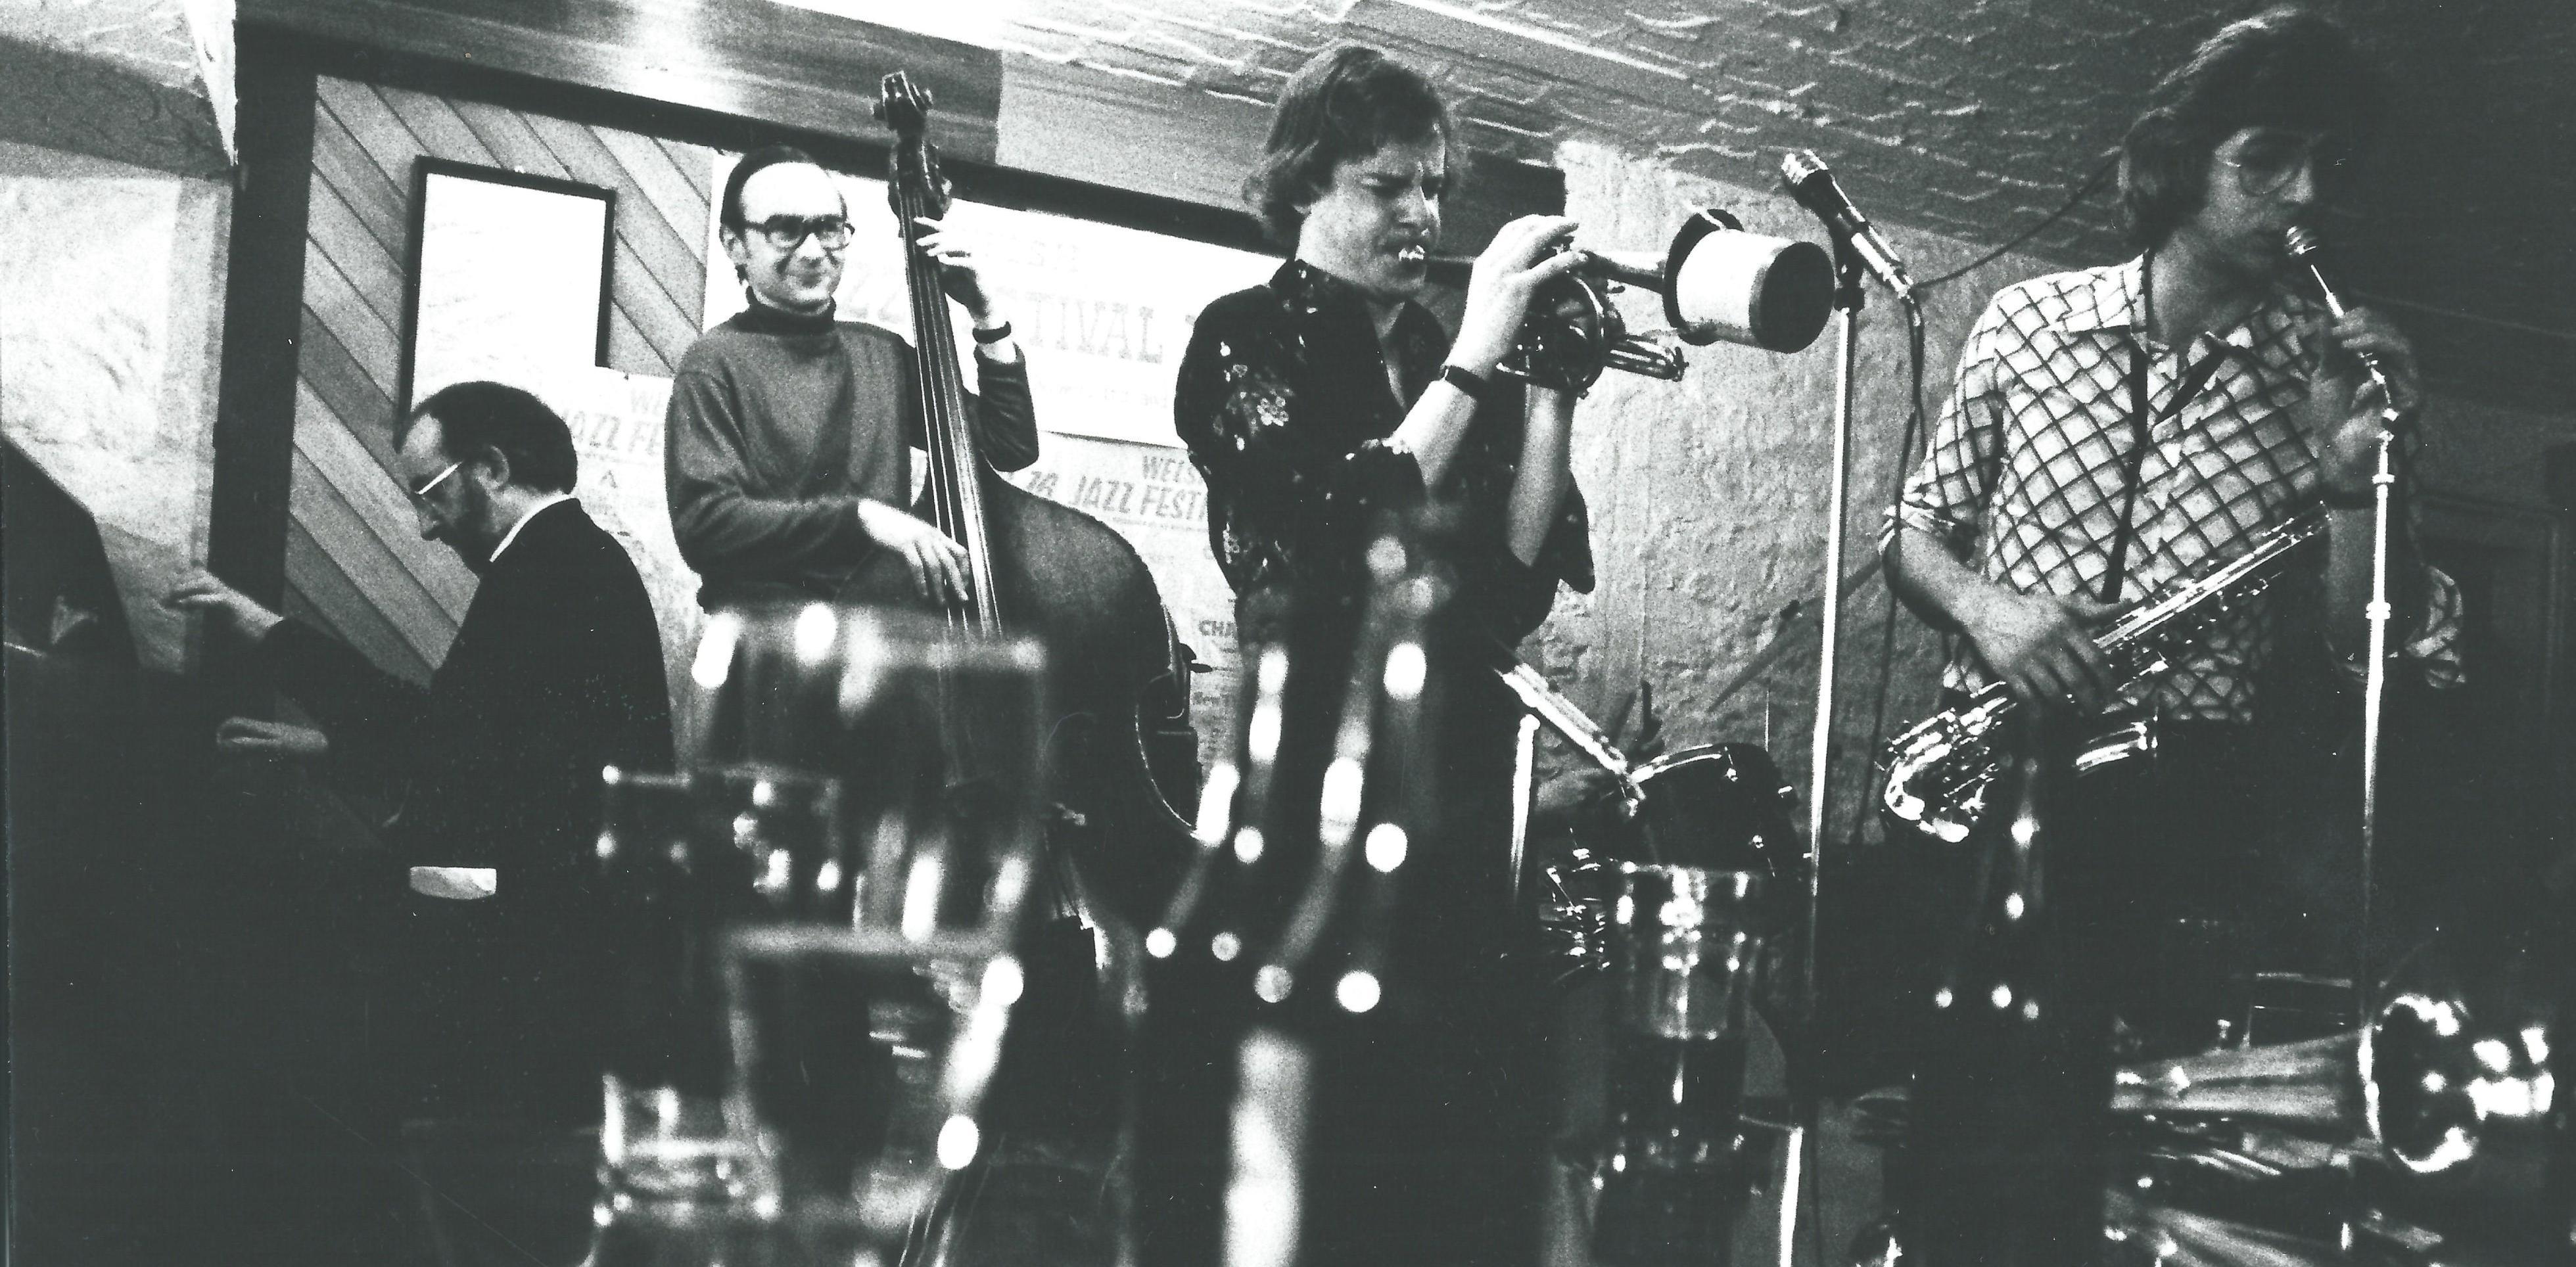 Chris Hodgkins And His Band